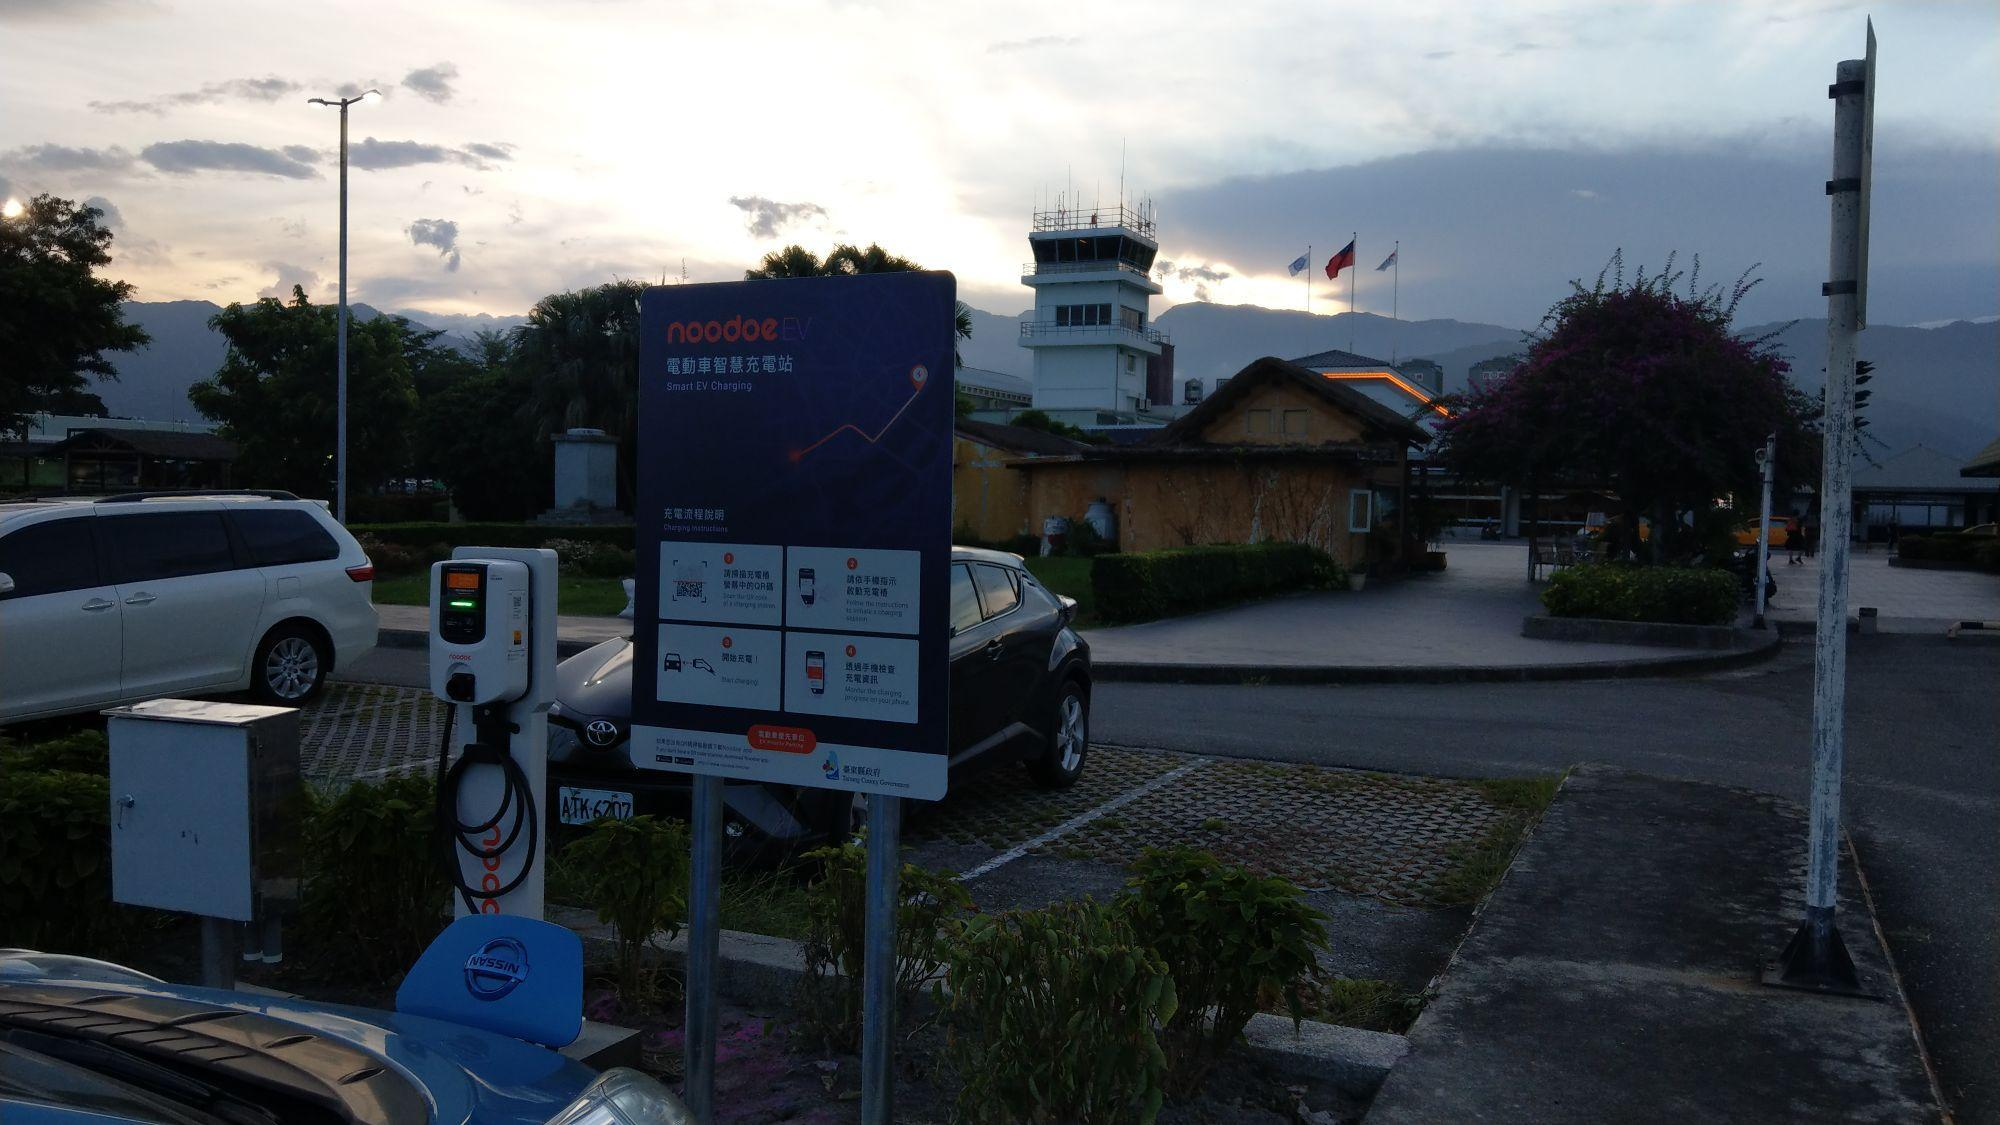 臺東機場停車場 | PlugShare